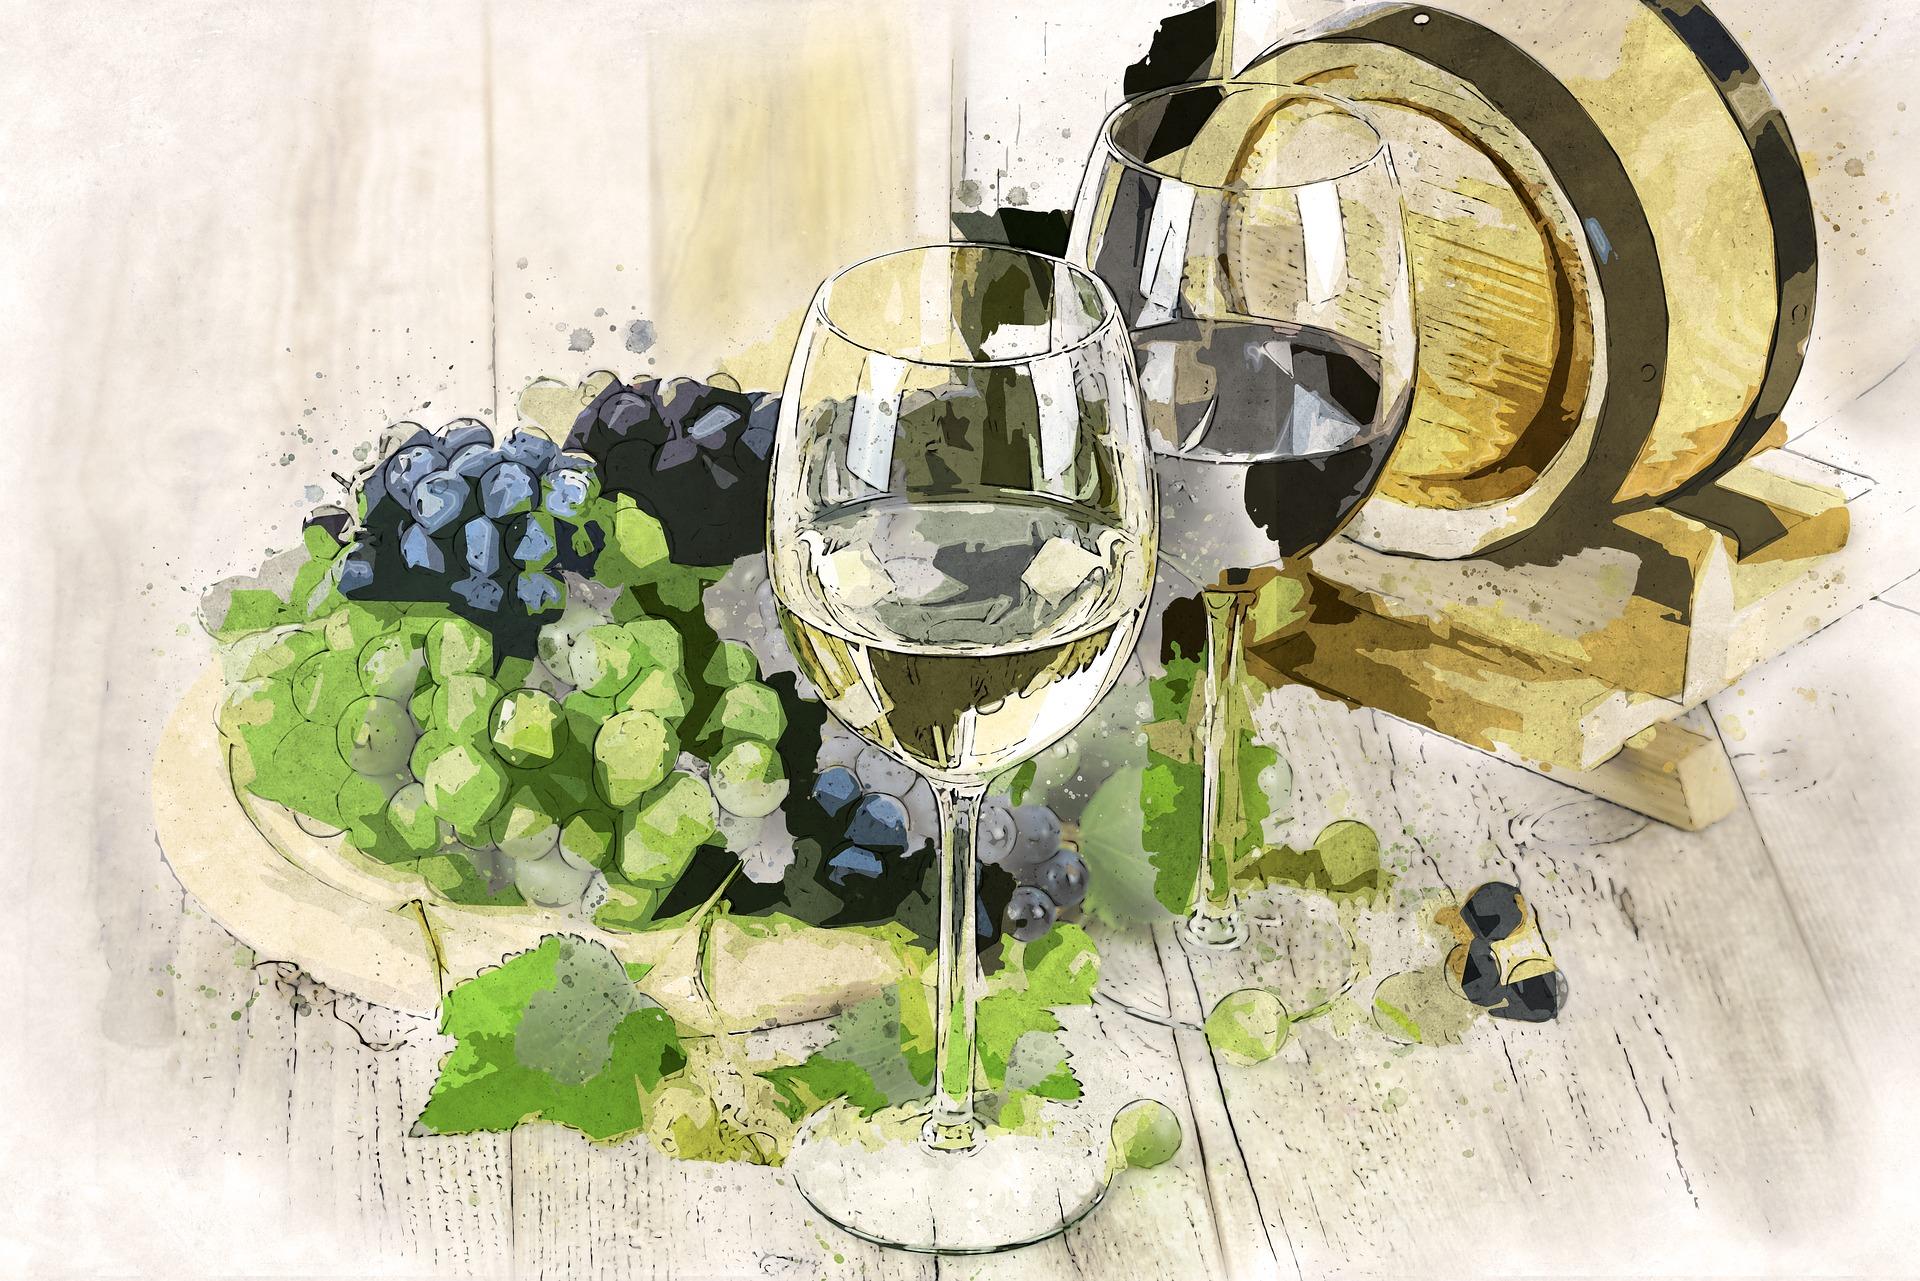 two-types-of-wine-2466267-1920.jpg